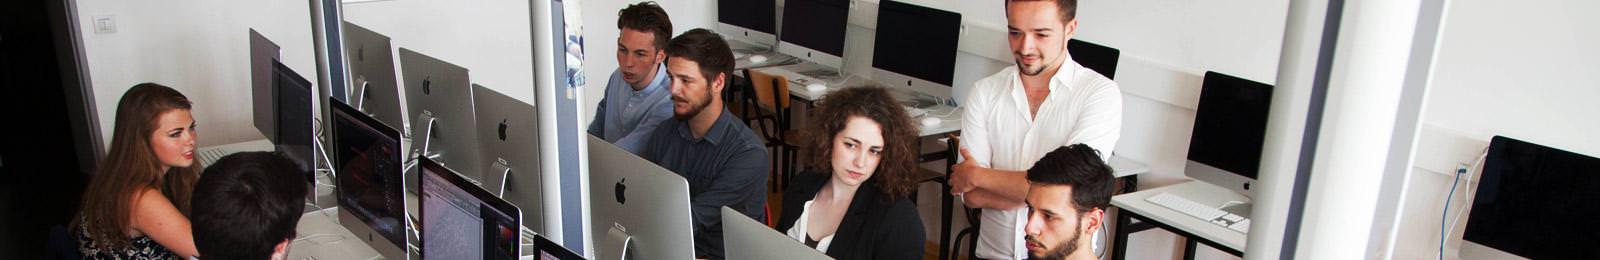 visuel digital campus